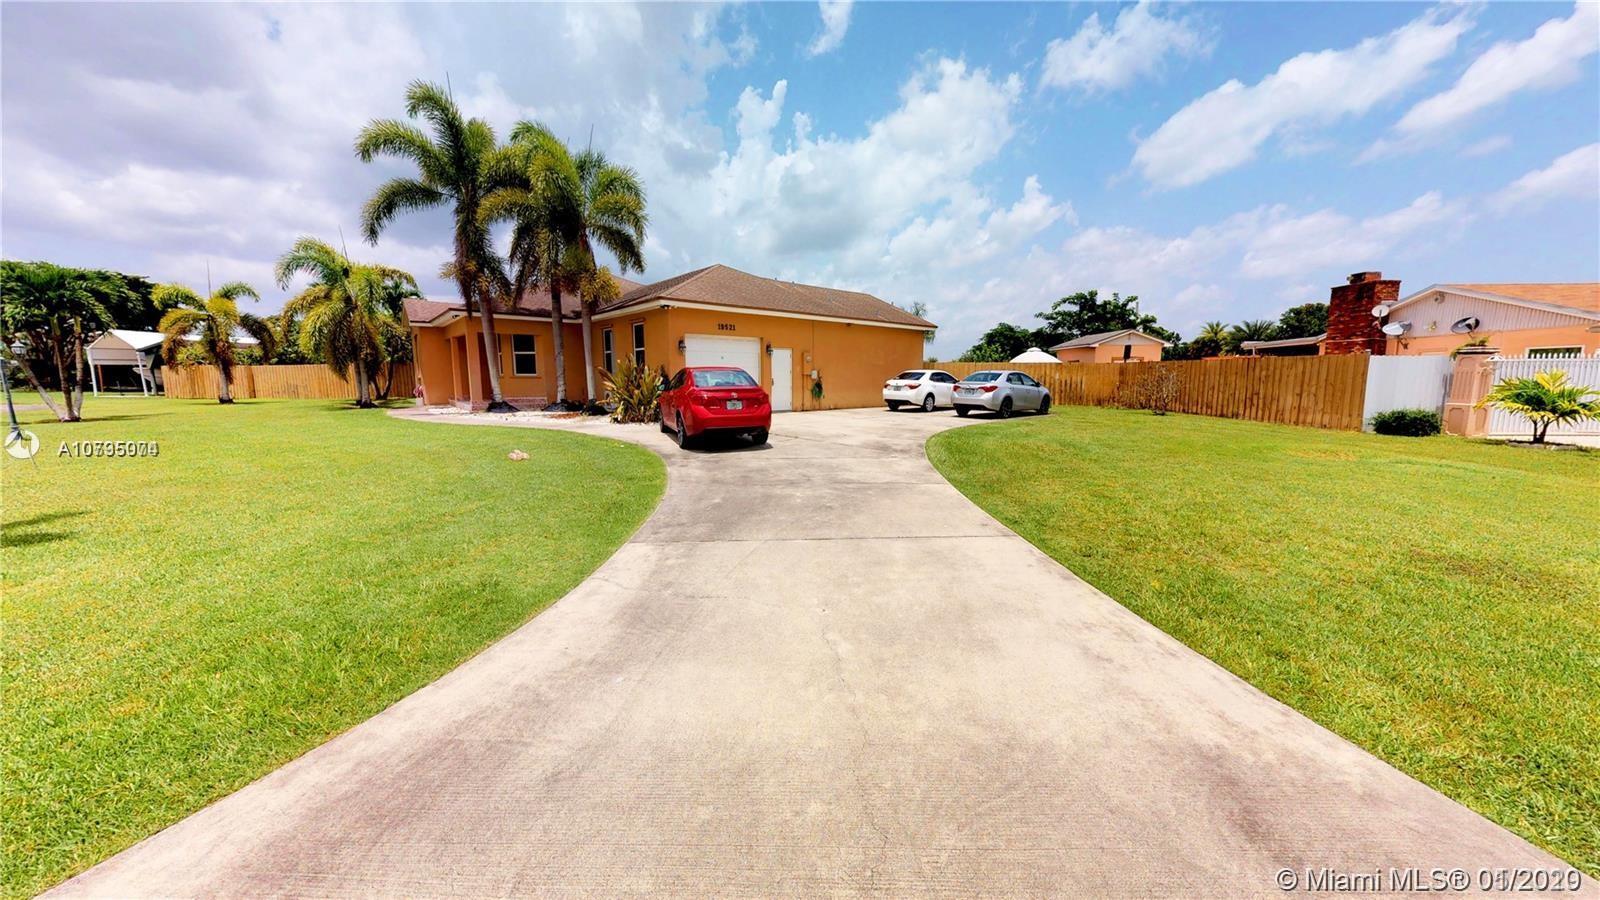 19521 SW 307th St, Homestead, FL 33030 - Homestead, FL real estate listing